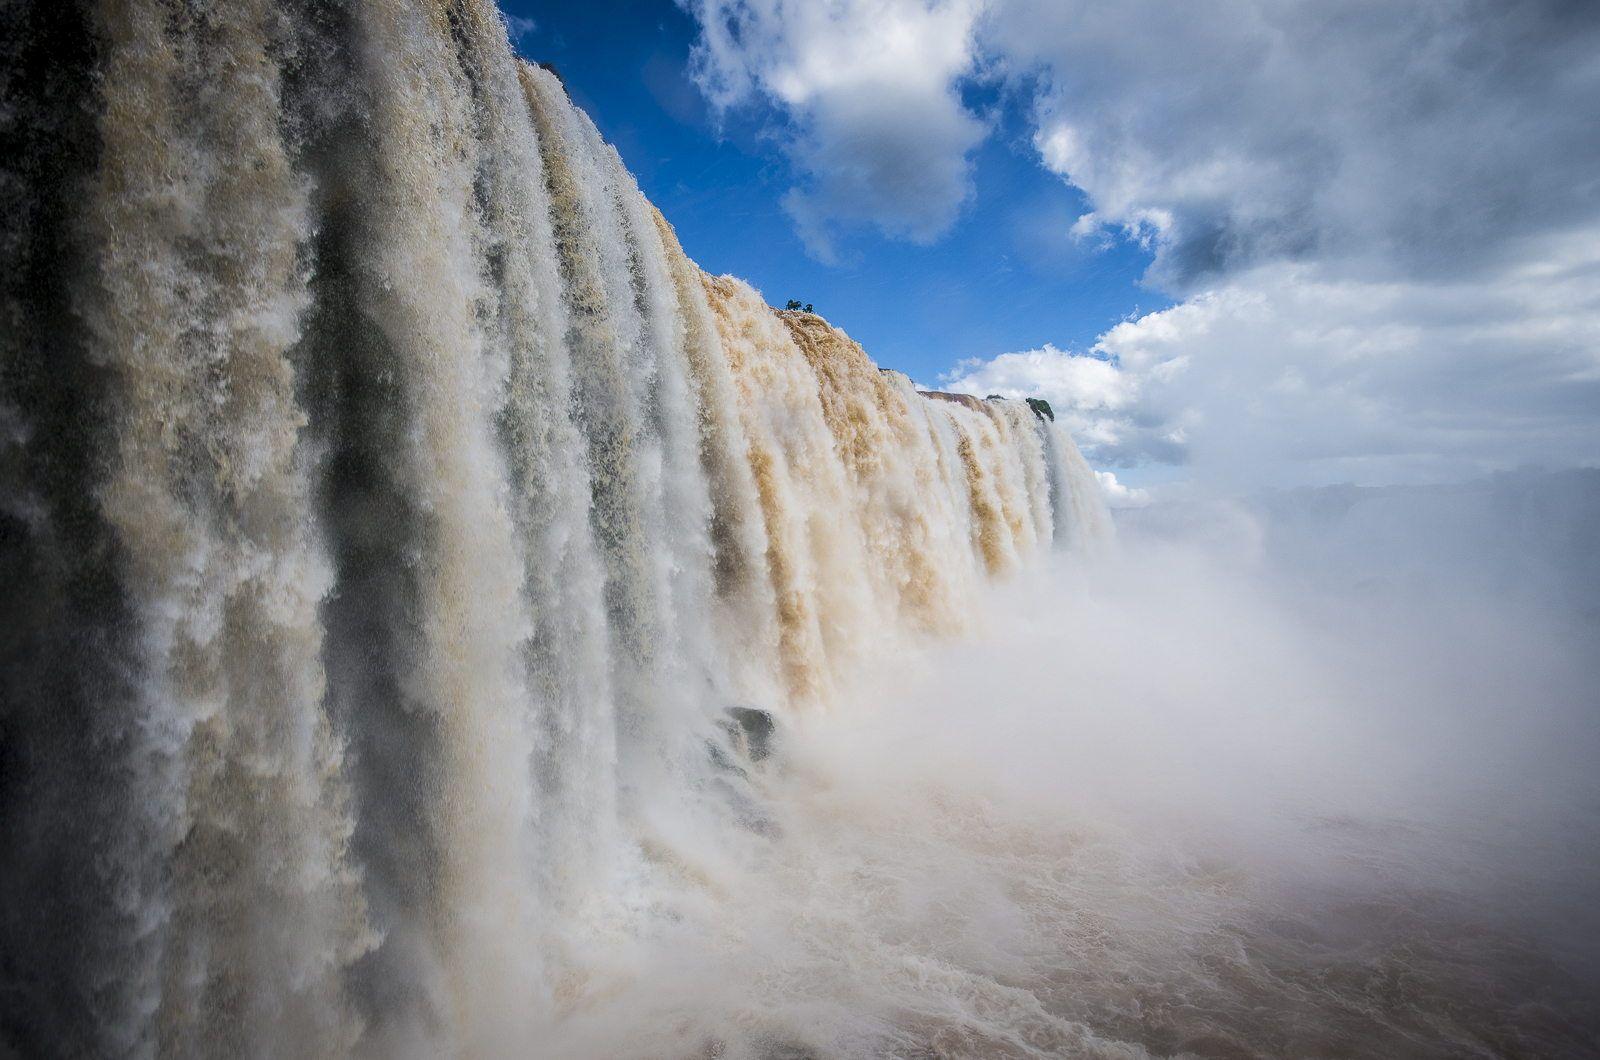 Fotografia Garganta do Diabo por Romain Bertucelli em 500px - Iguaçu - Brasil